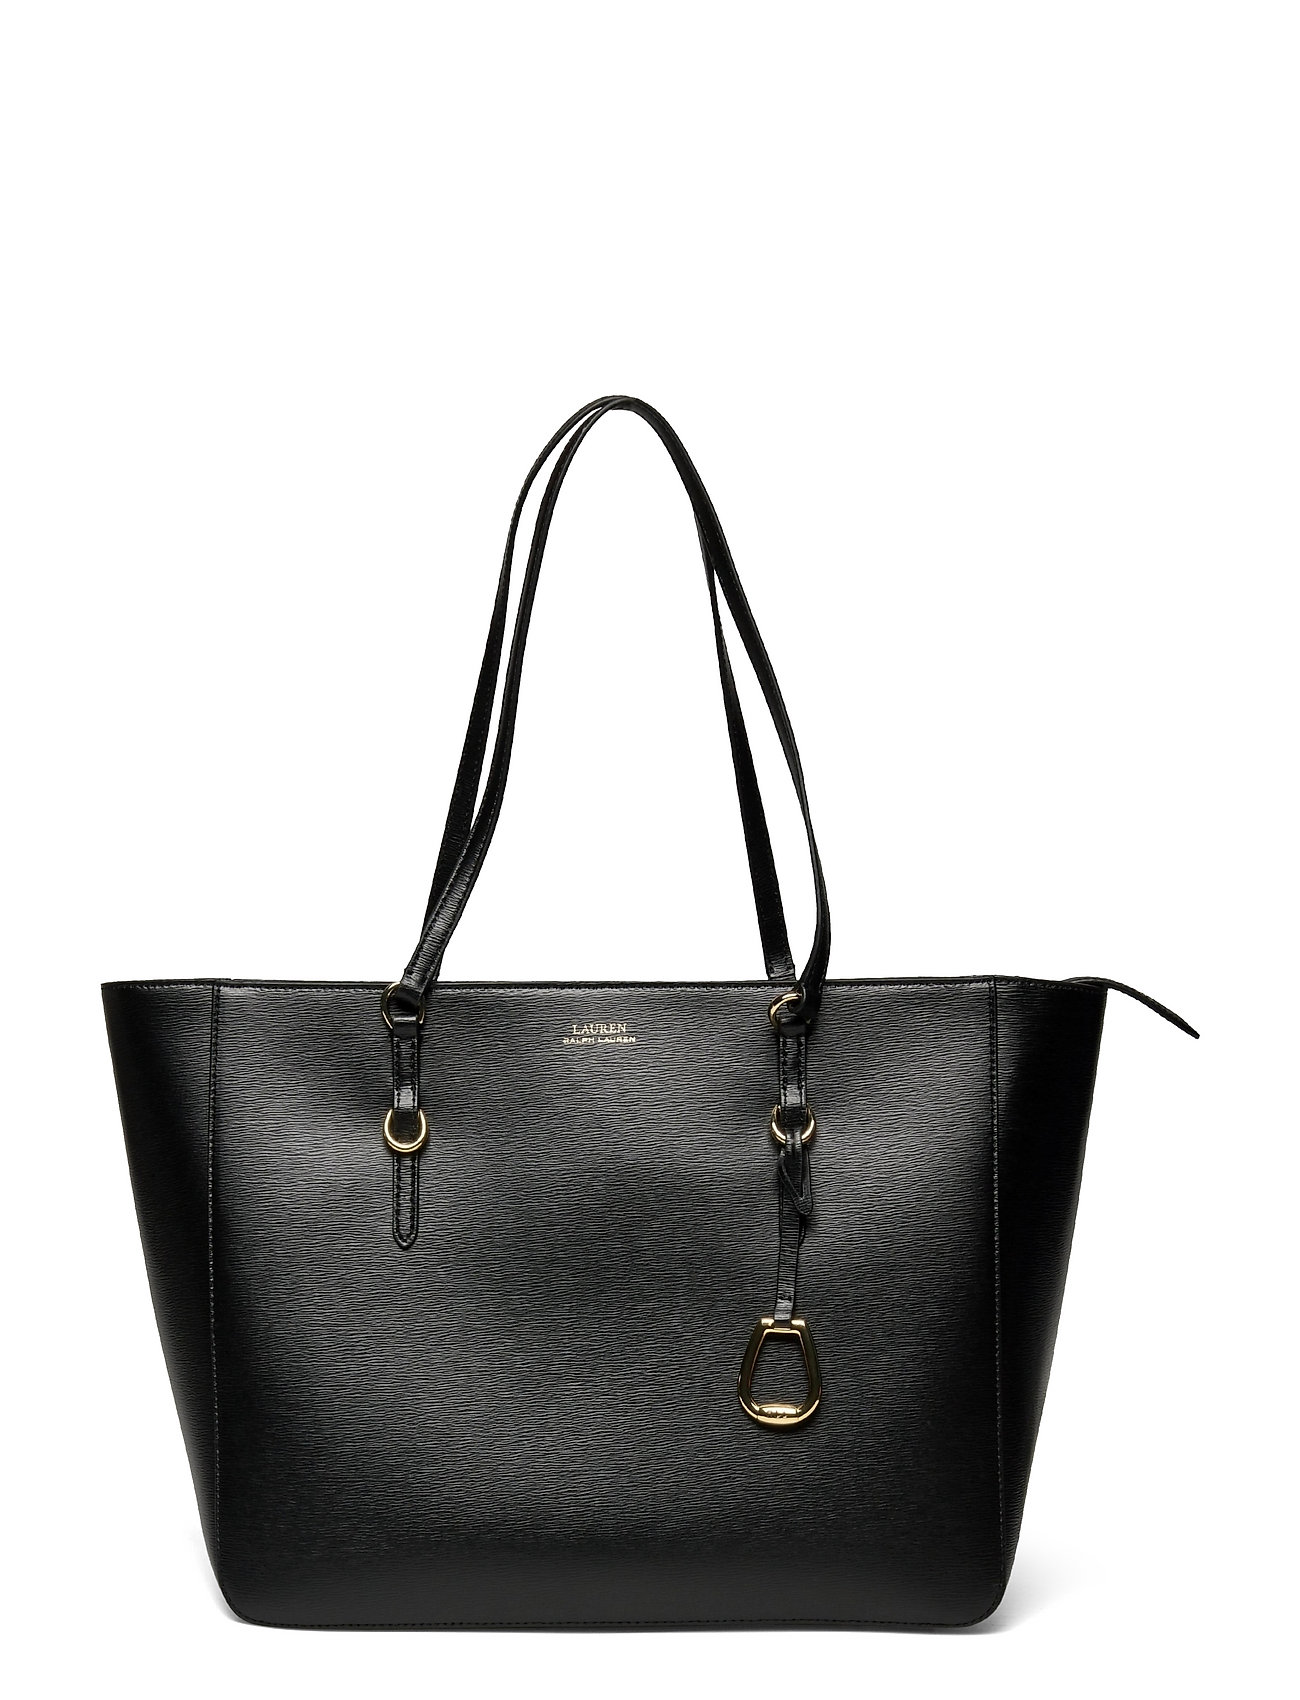 0c6810bdd252 ... 50% off lauren ralph lauren saffiano leather tote ad018 44a6c